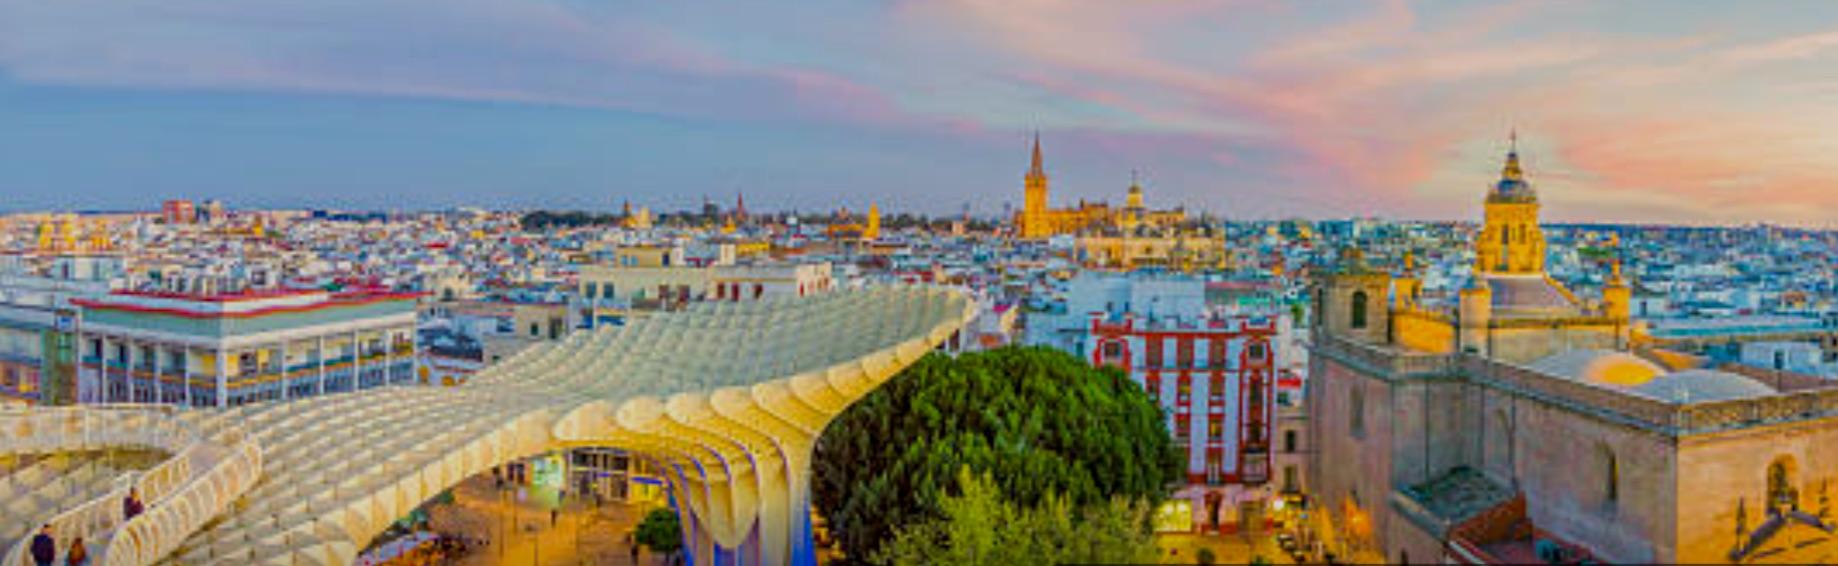 "First meeting of ""La Voz de la Industria Andaluza"" on April 11 in Seville"